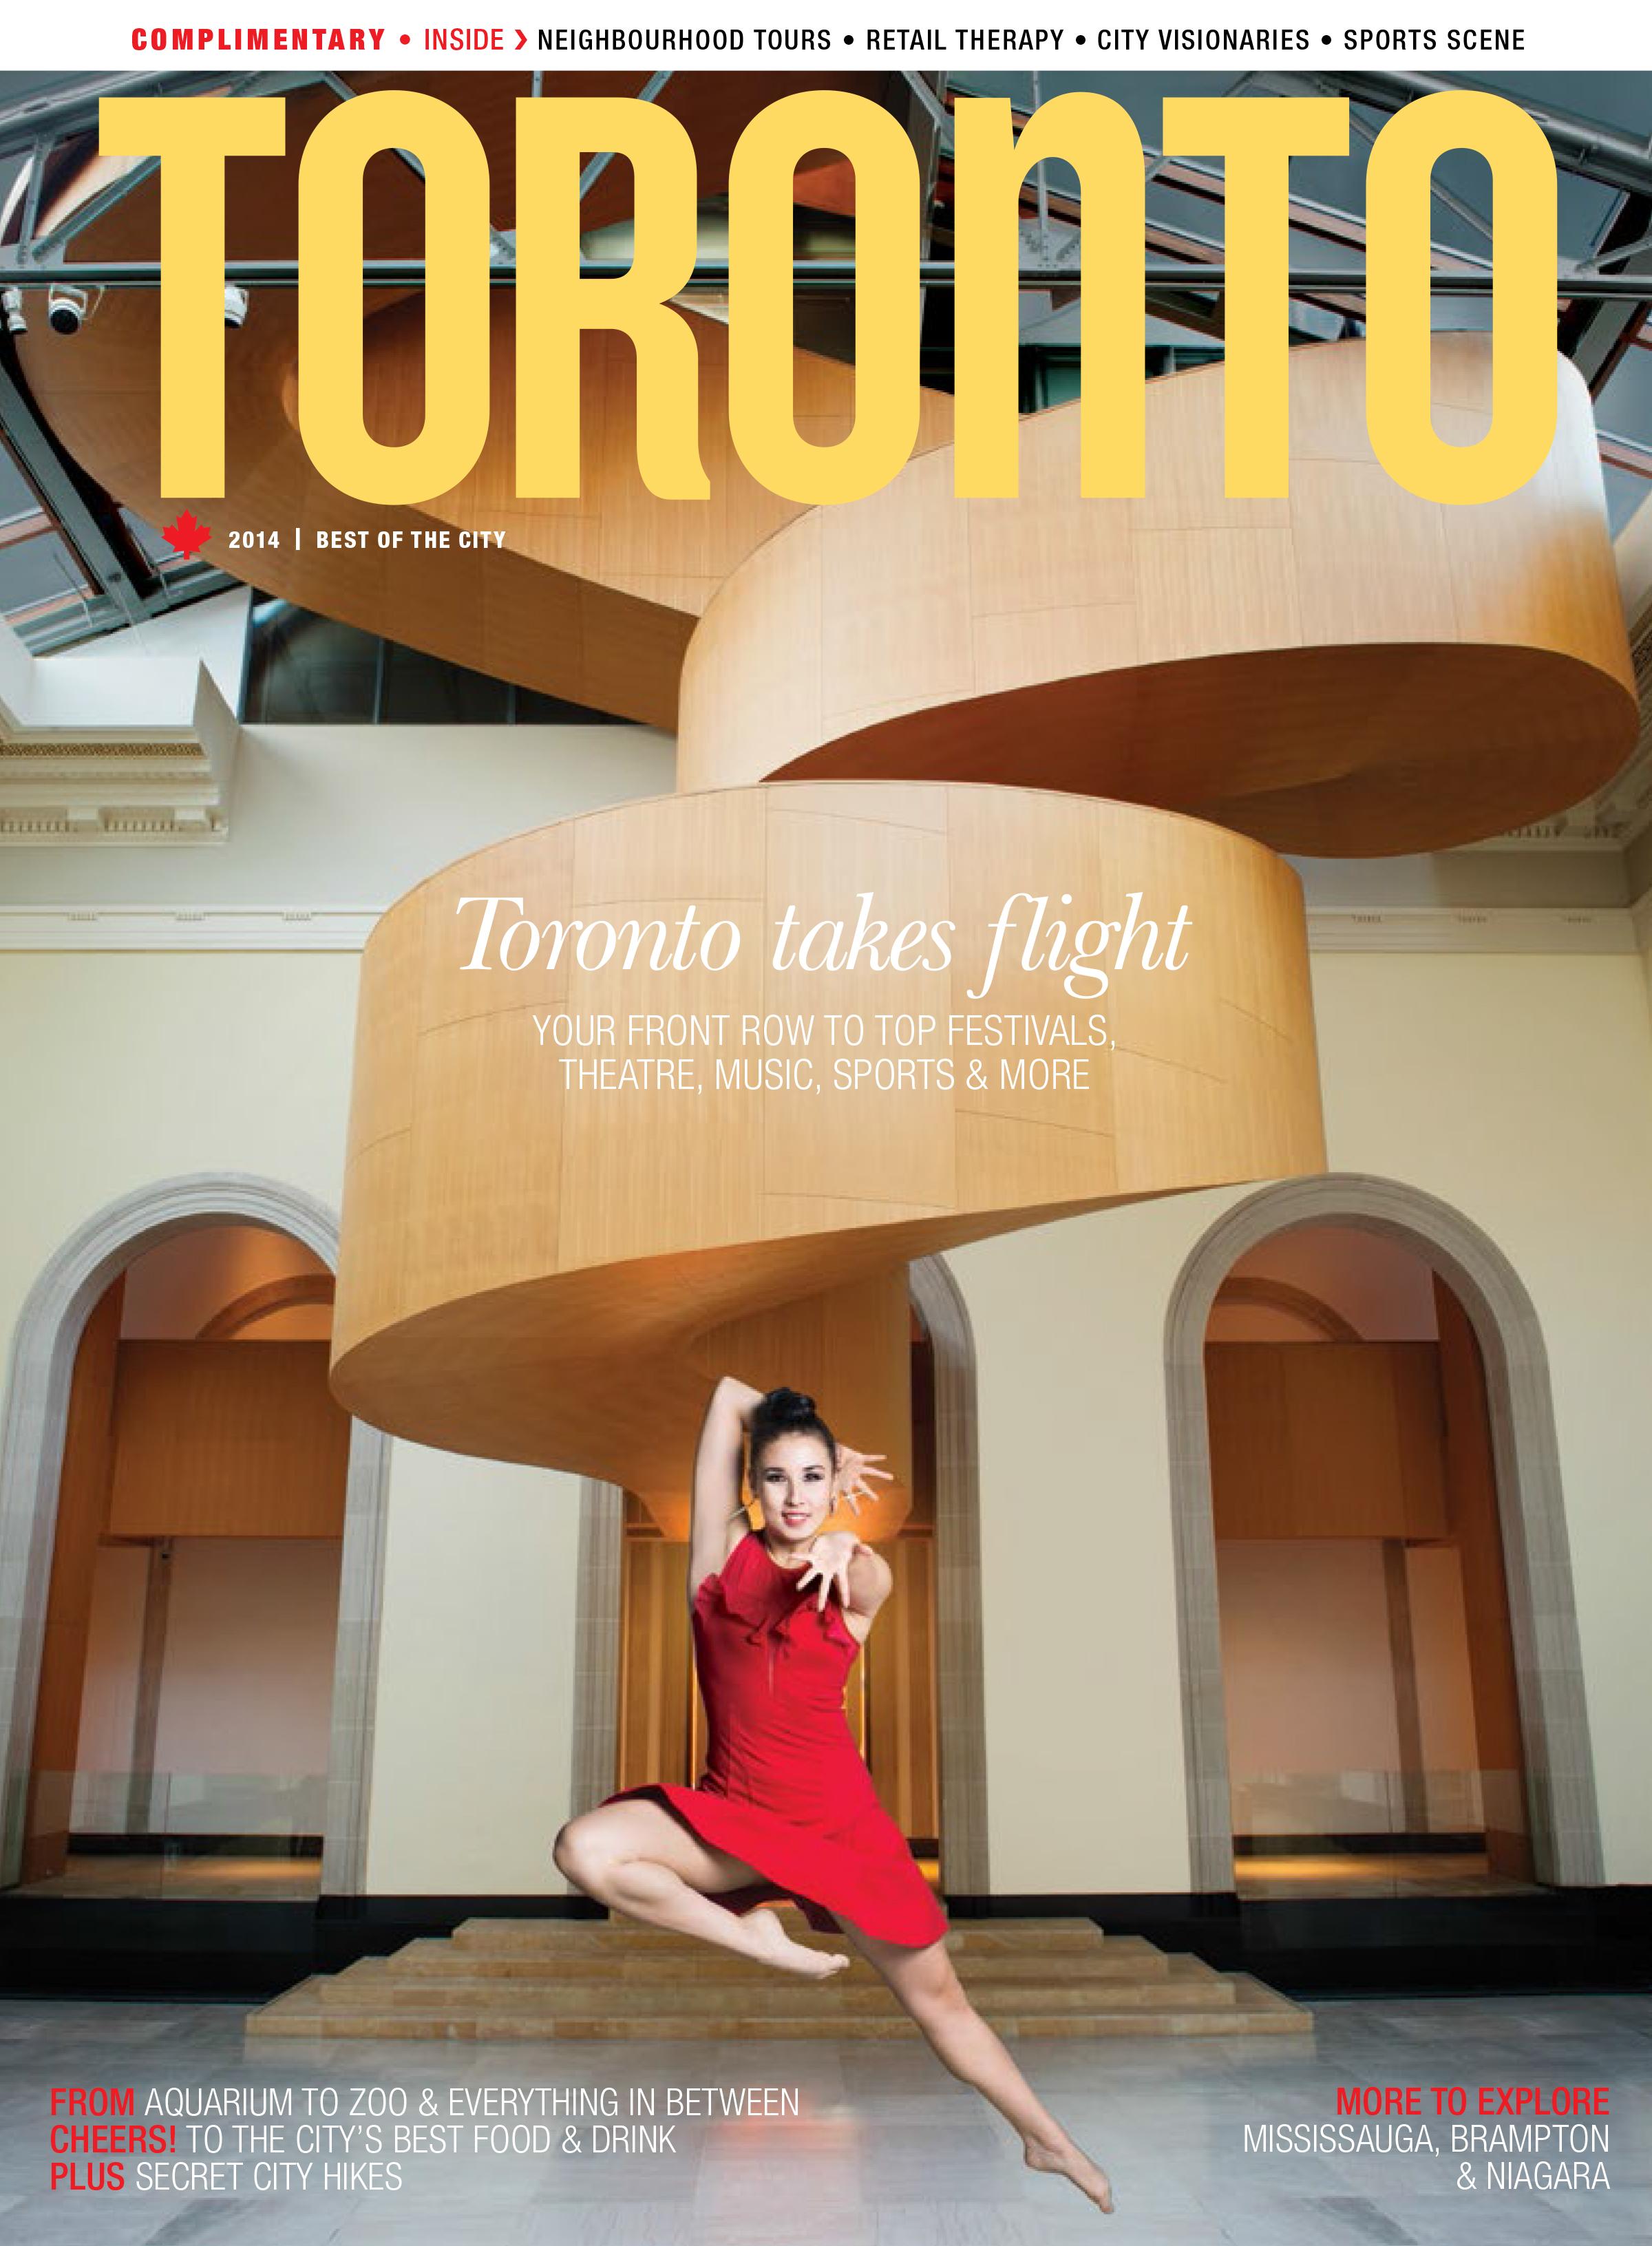 Toronto Tourism 2014 Magazine